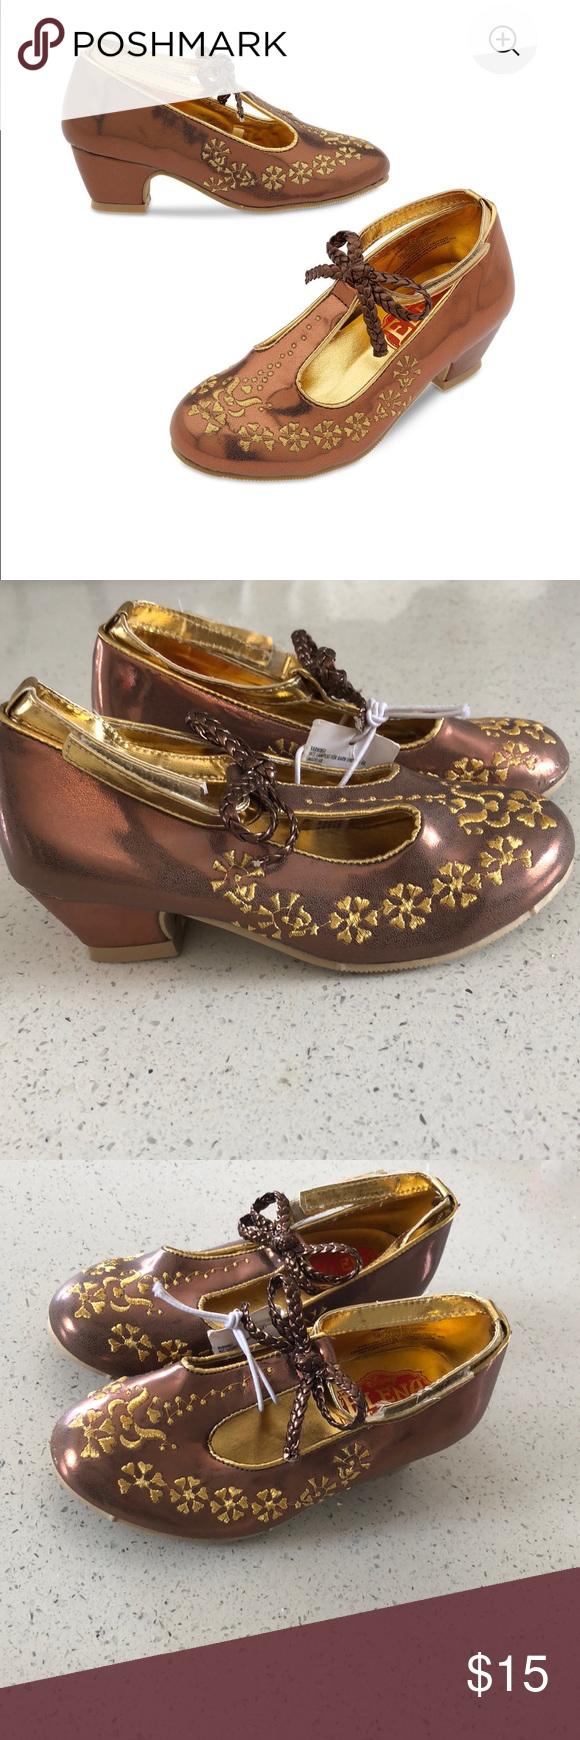 Gold Elena of Avalor costume shoes